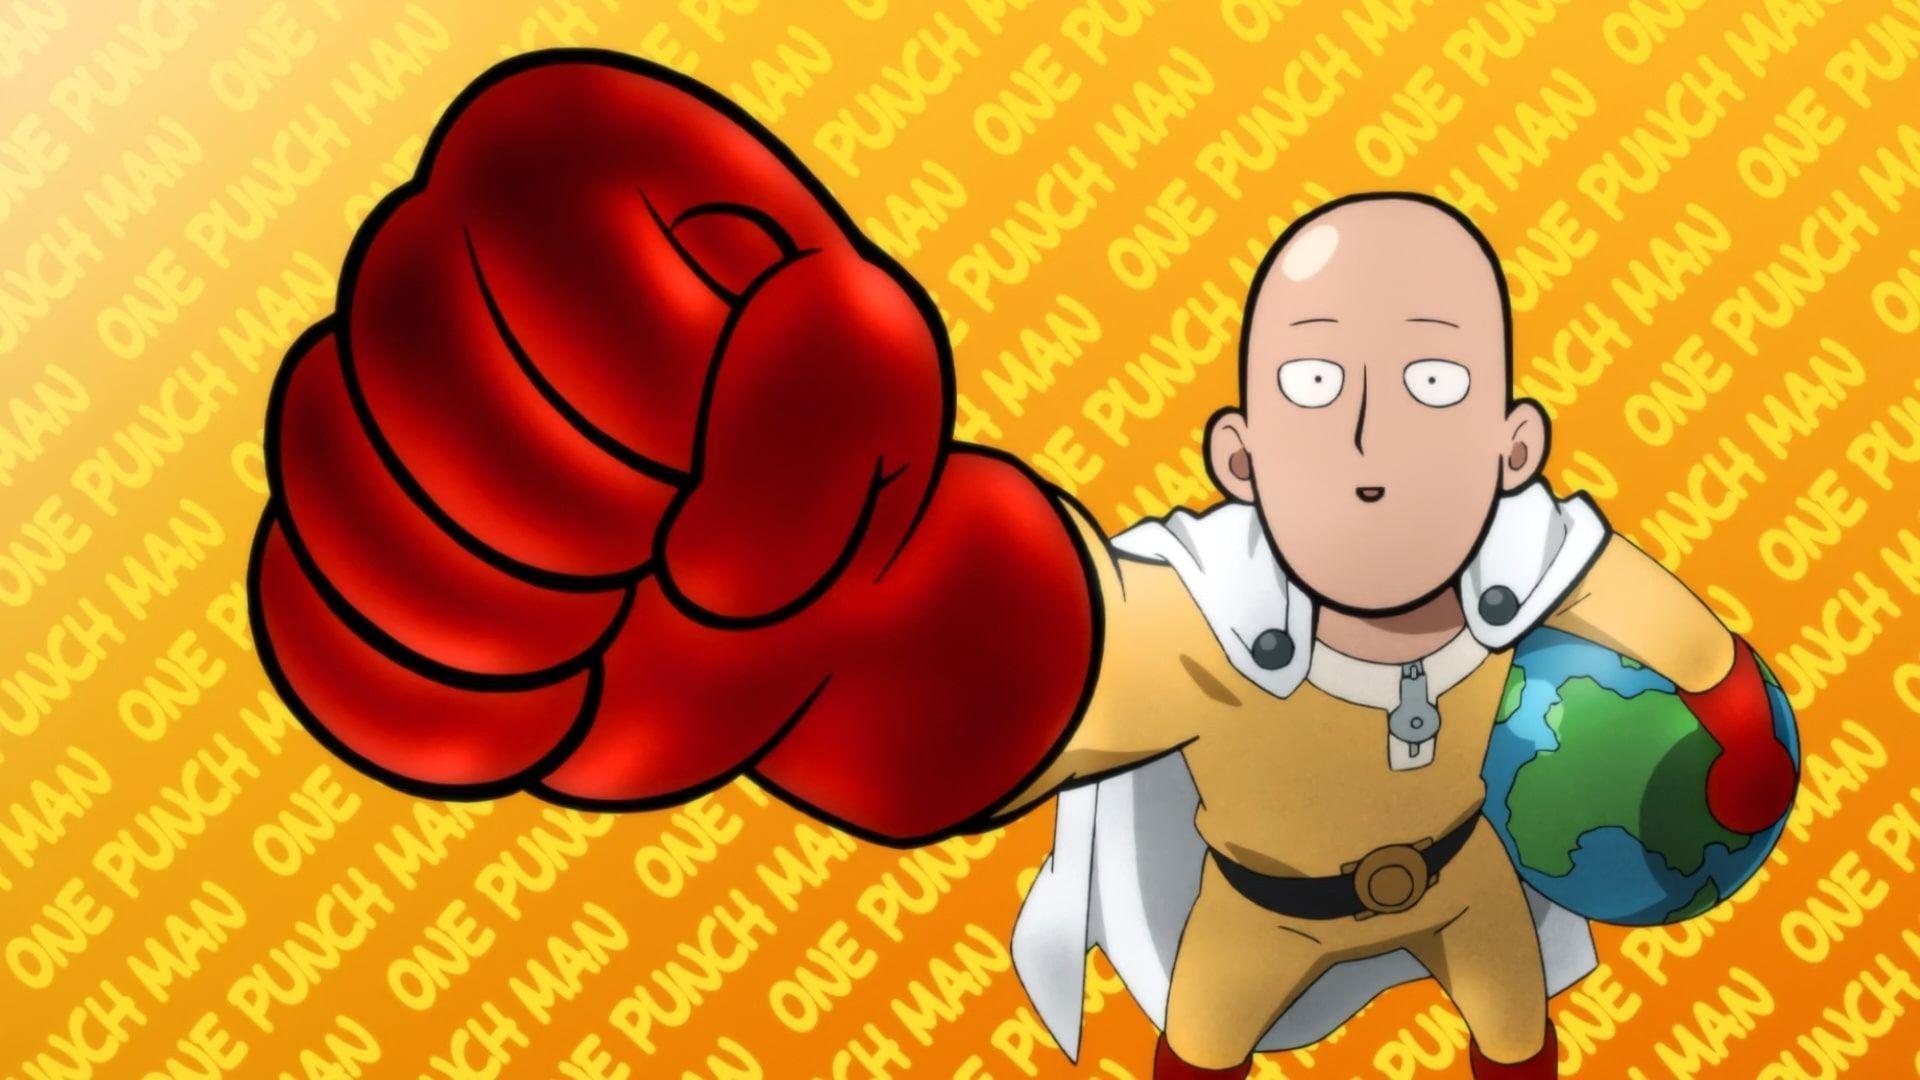 One Punch Man Season 2 Wallpapers Top Free One Punch Man Season